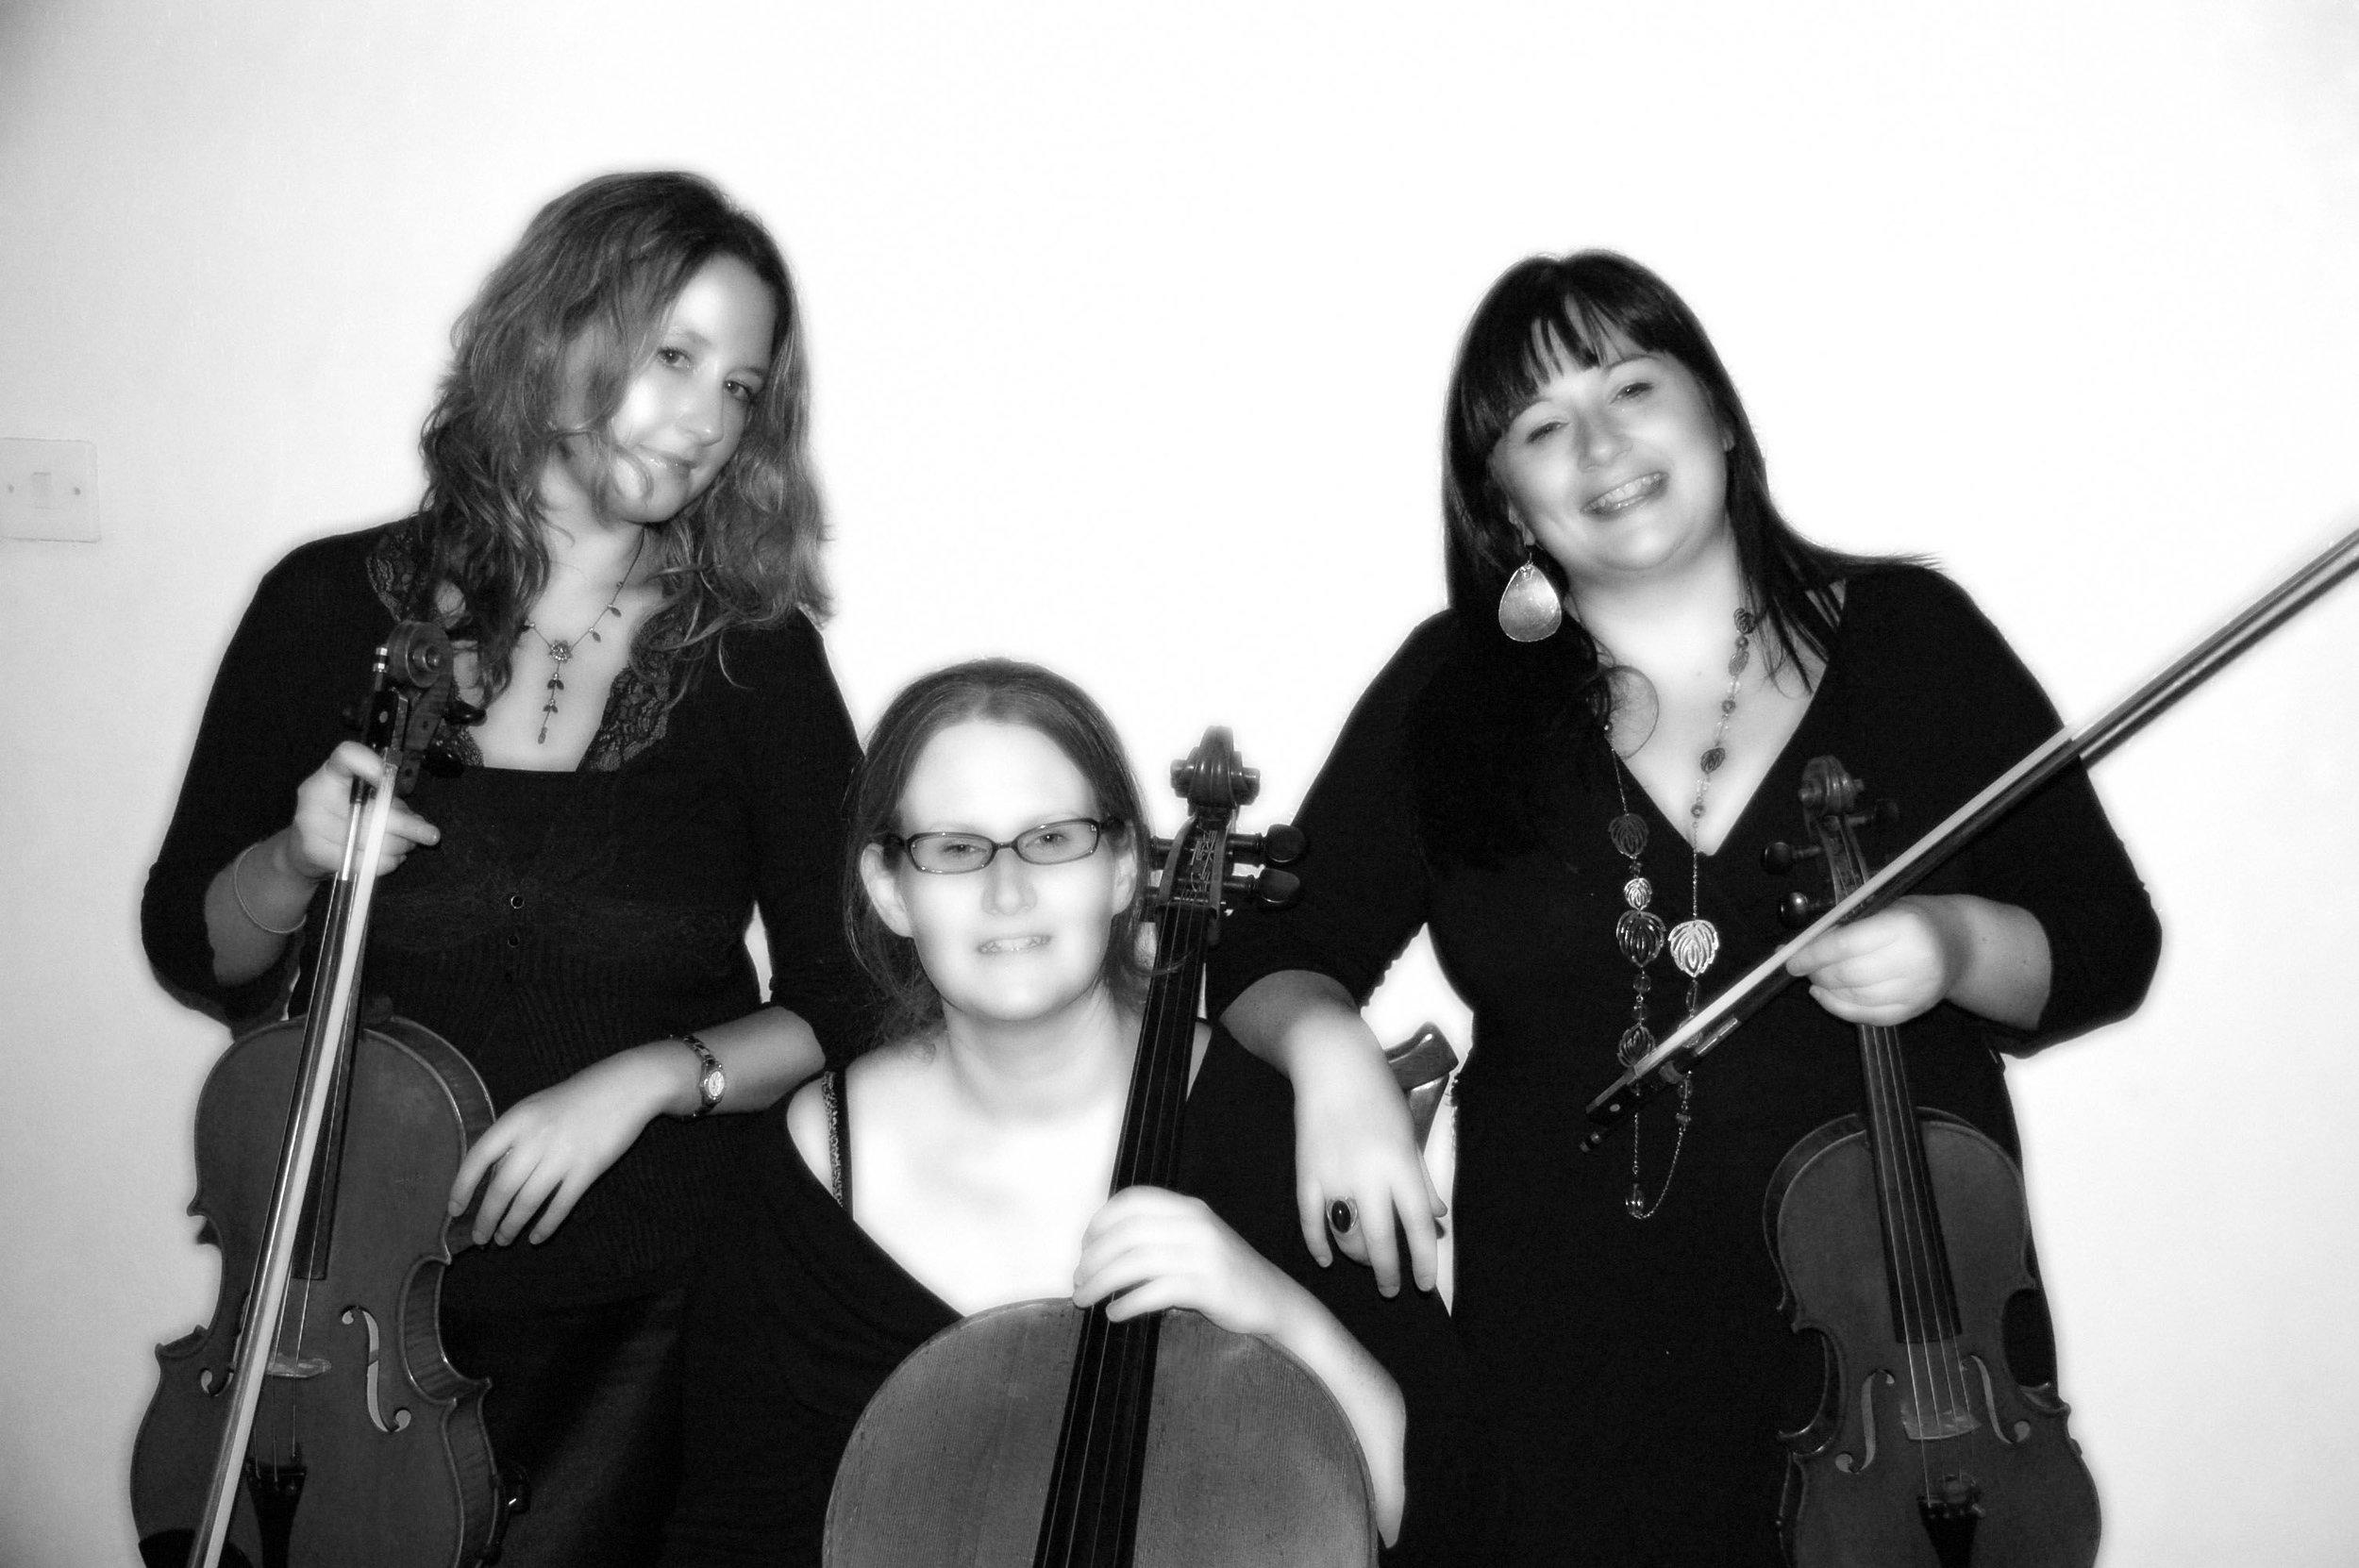 trio black and white.jpg